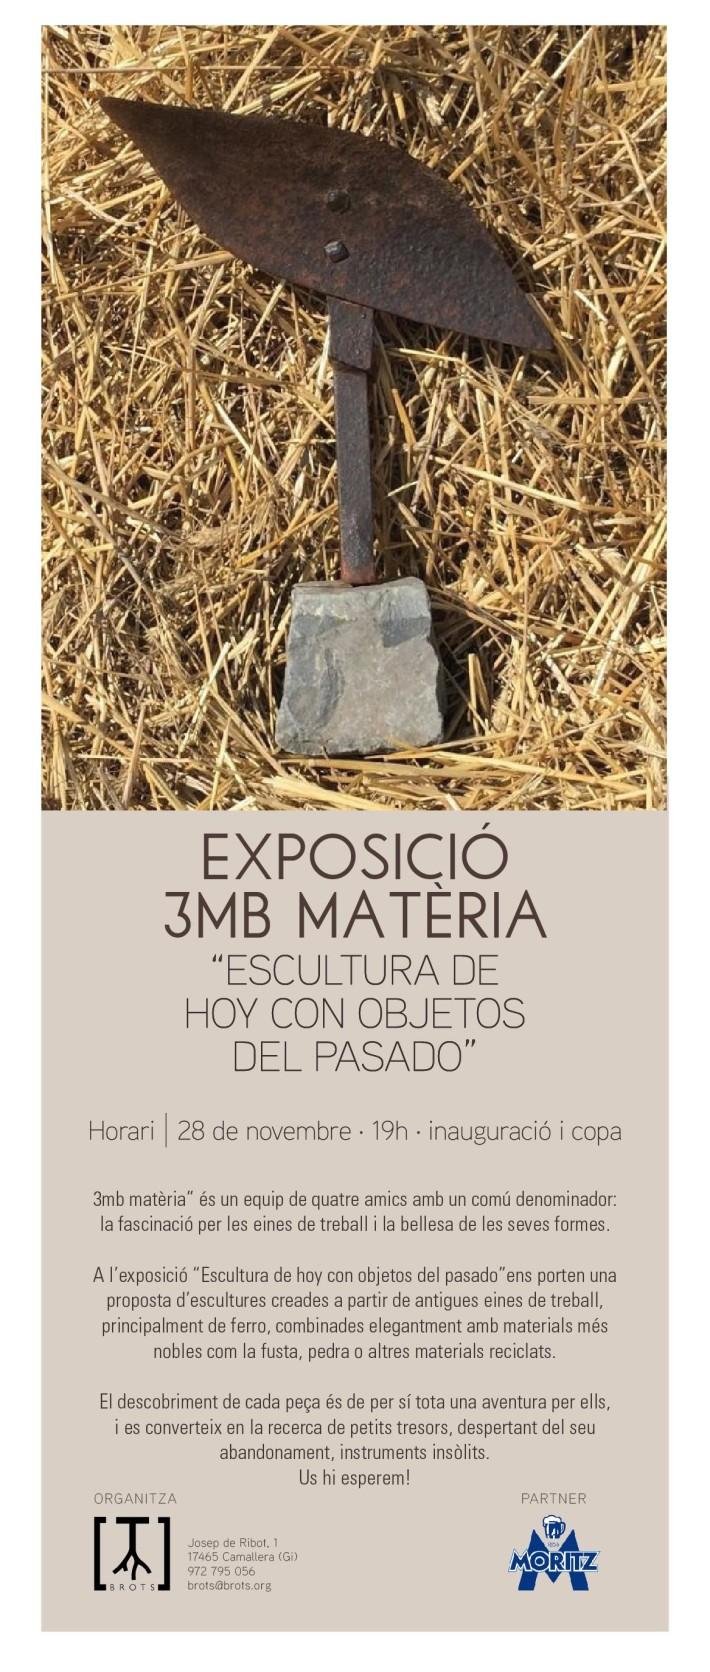 Exposición 3mb materia en espai BROTS.